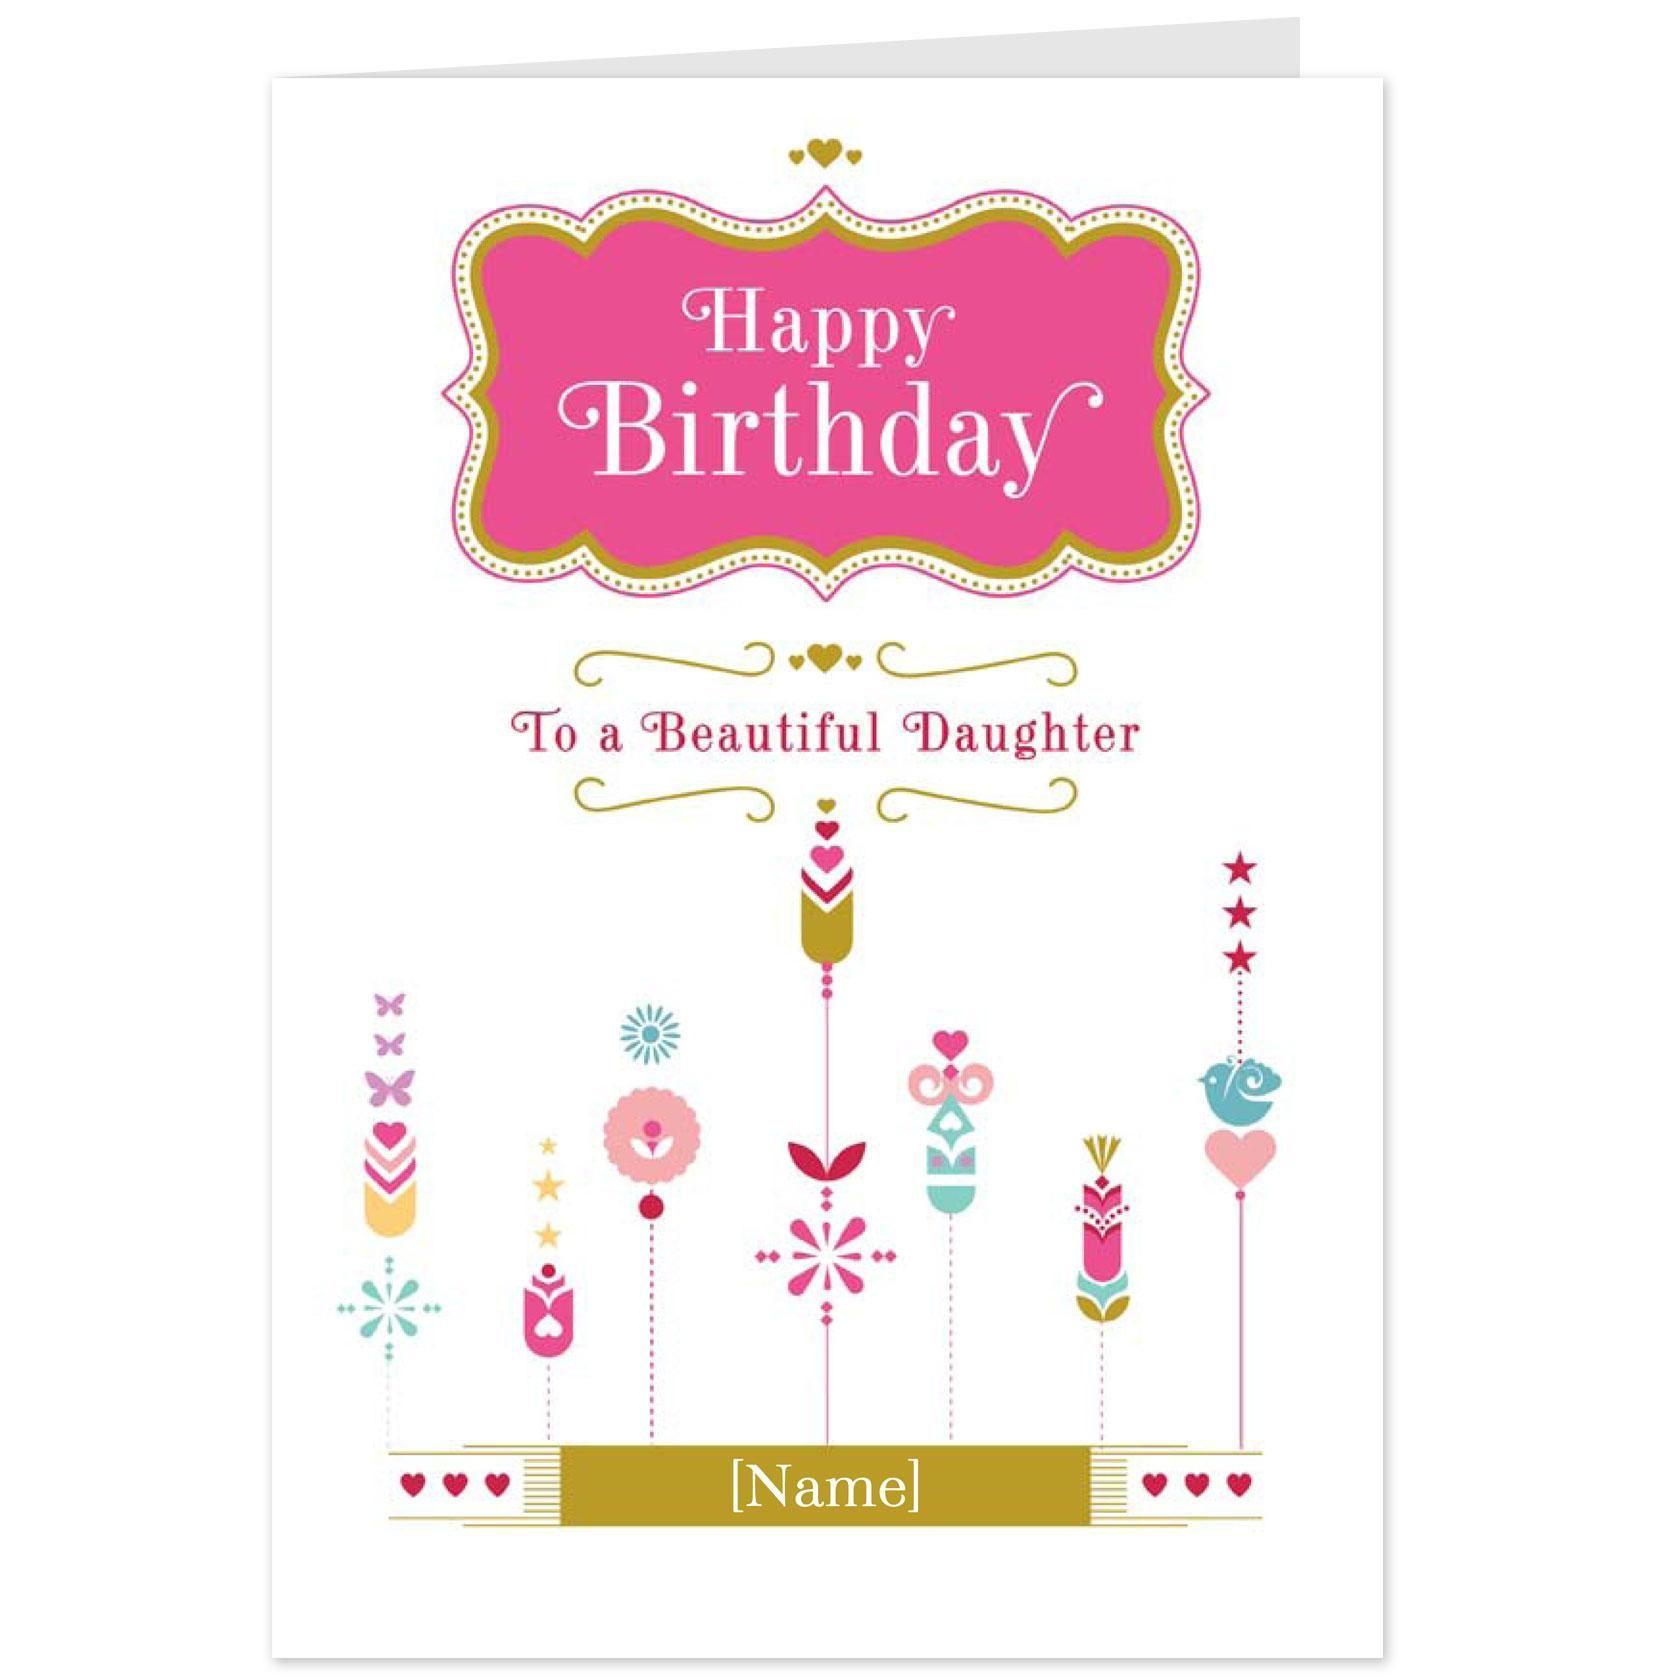 Free Printable Hallmark Birthday Cards | My Birthday - Free Printable Hallmark Cards